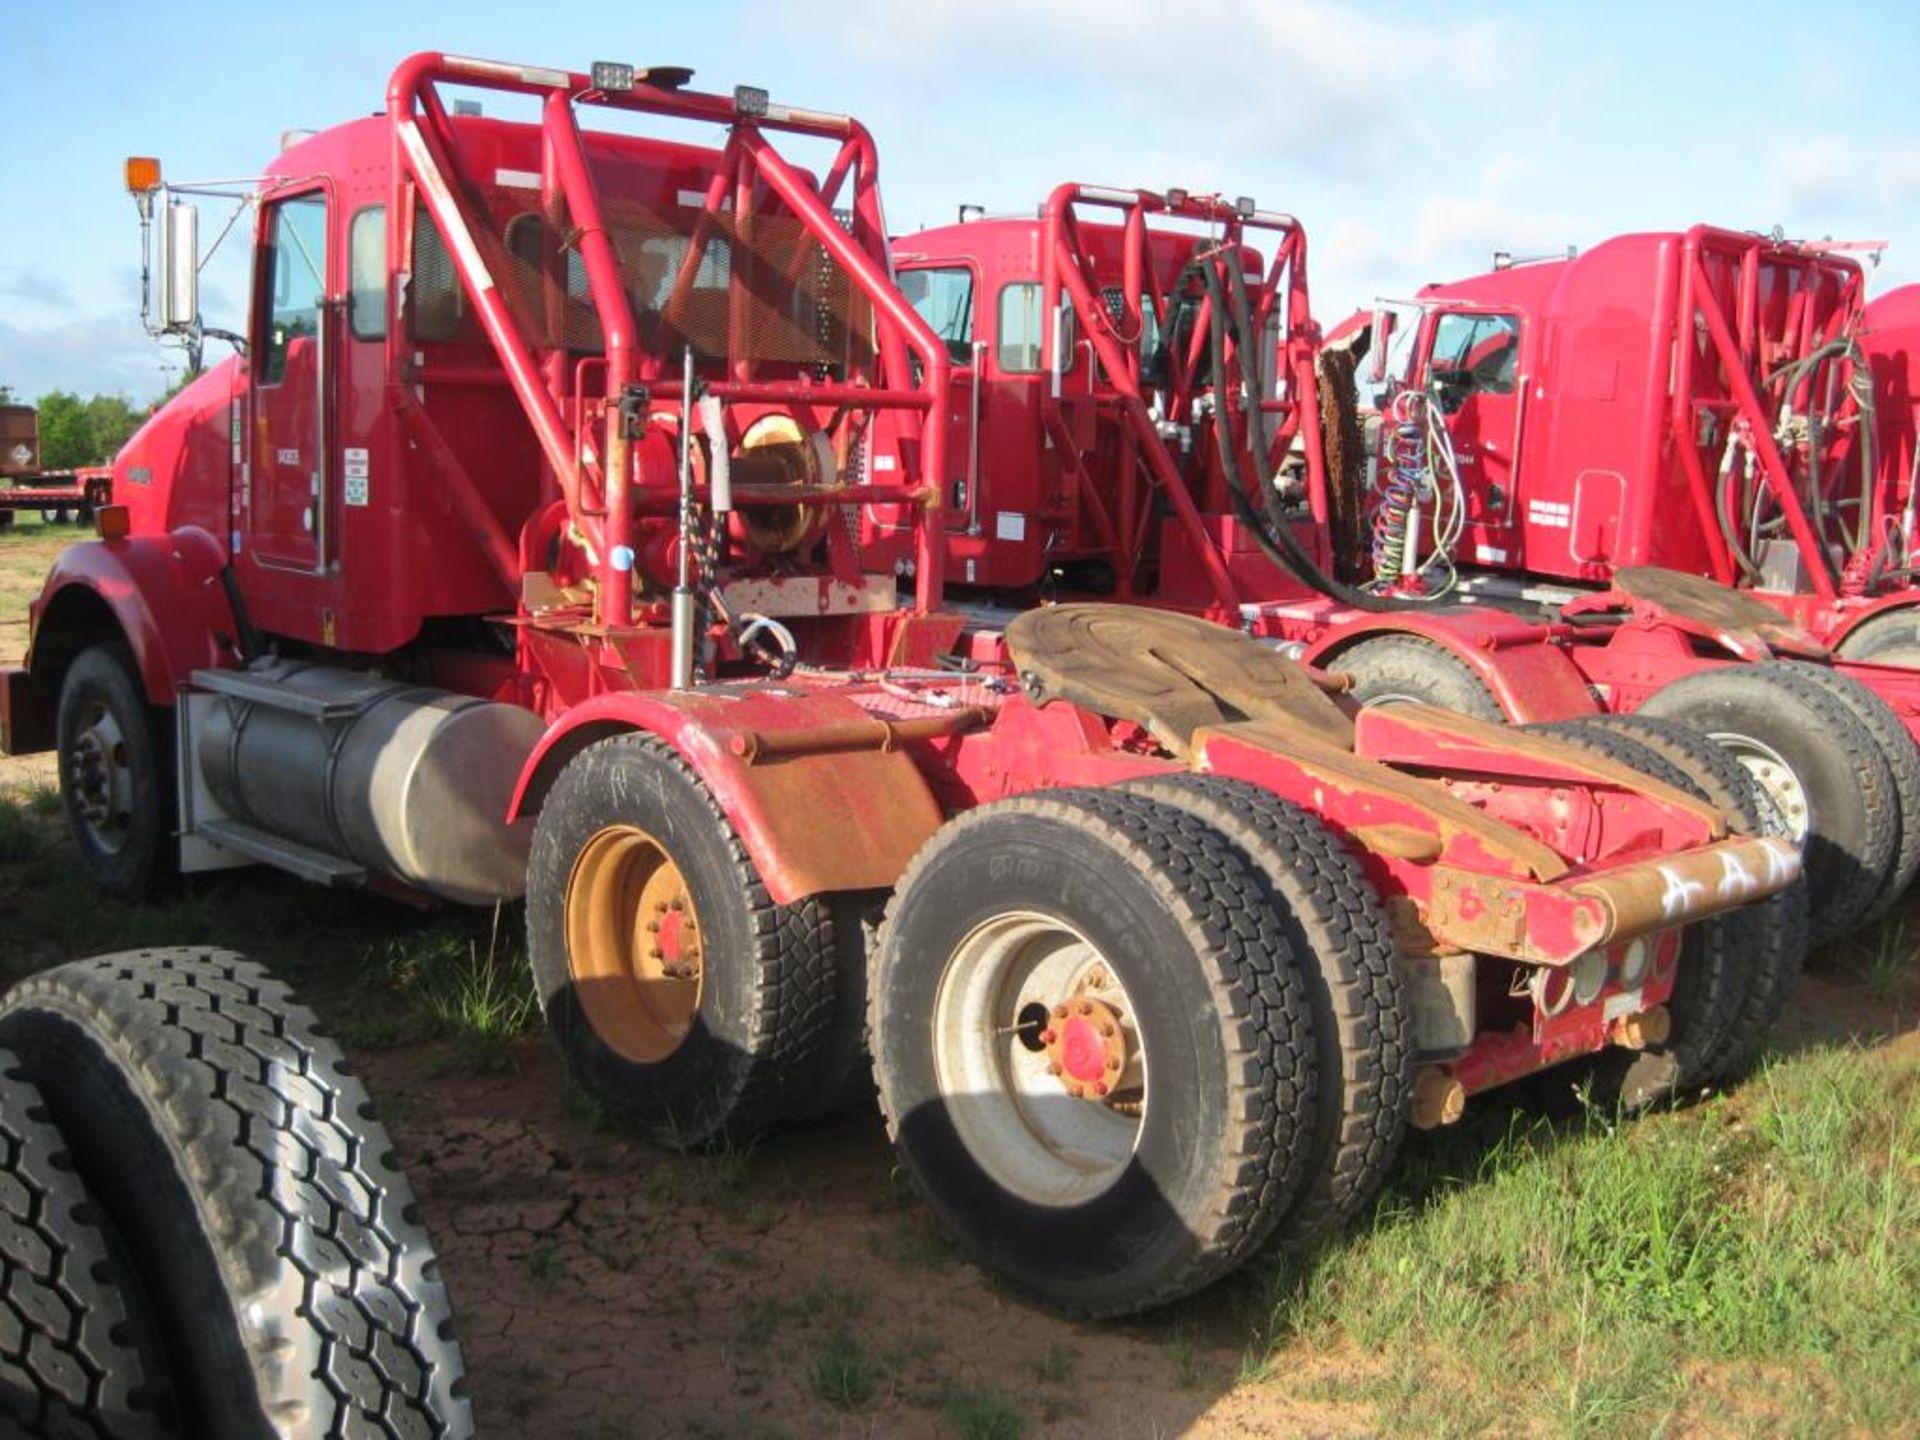 Kenworth Winch Truck - Image 4 of 22